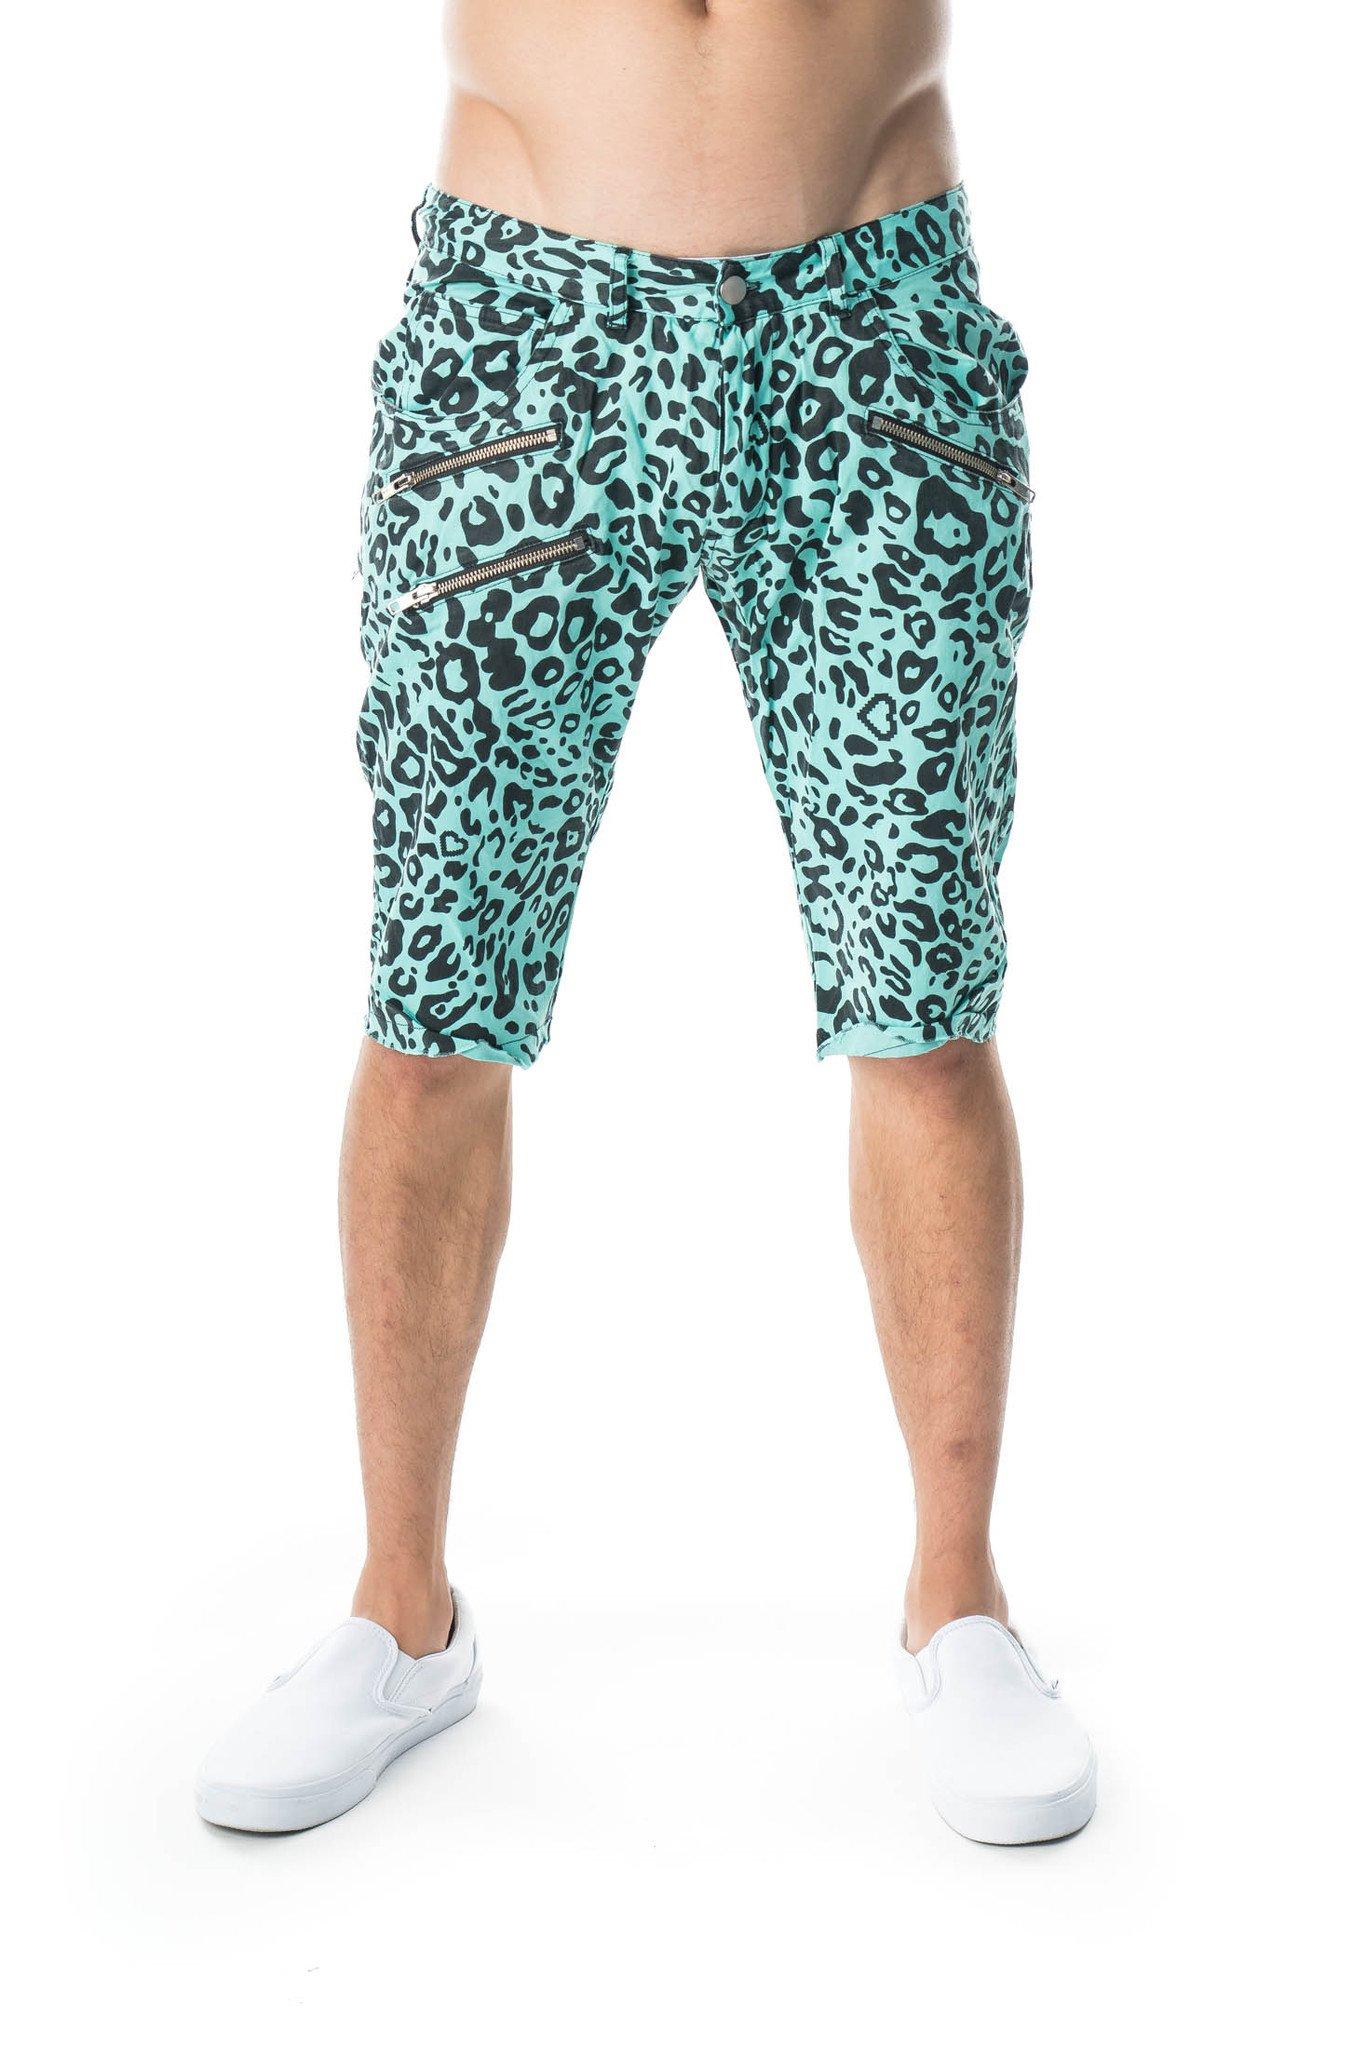 Party Rock Clothing★パーティーロッククロッシング ★La Freak Cheetah Huck Finns(アクアマリーン)